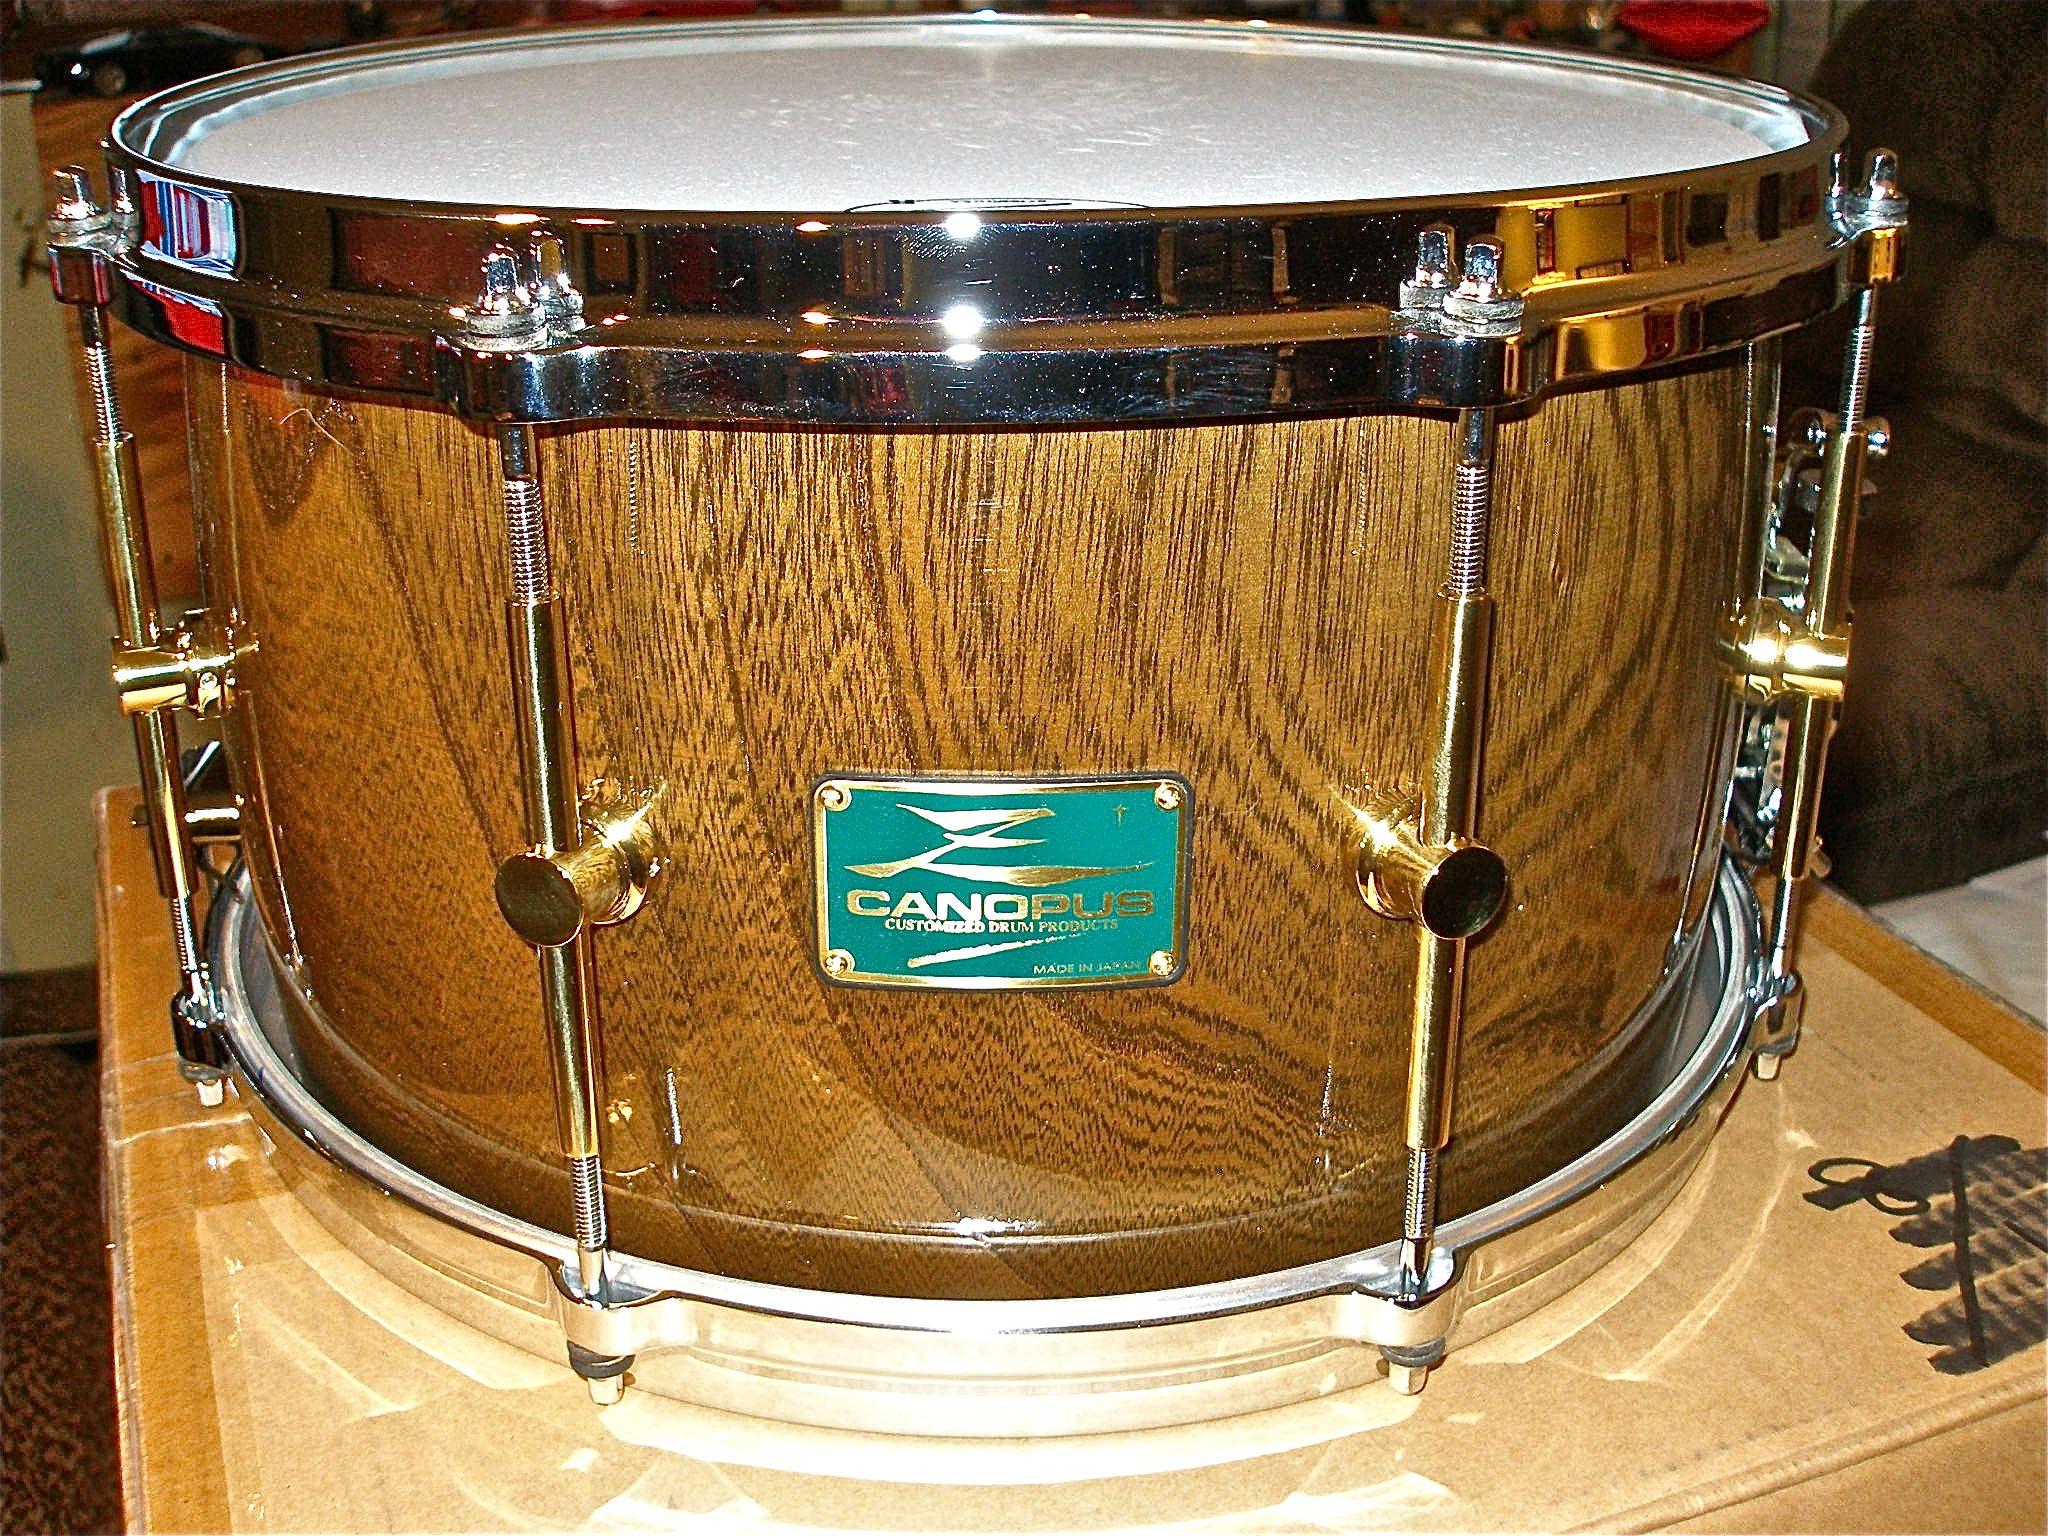 canopus 8x14 zelkova snares my snares in 2019 snare drum drums instruments. Black Bedroom Furniture Sets. Home Design Ideas